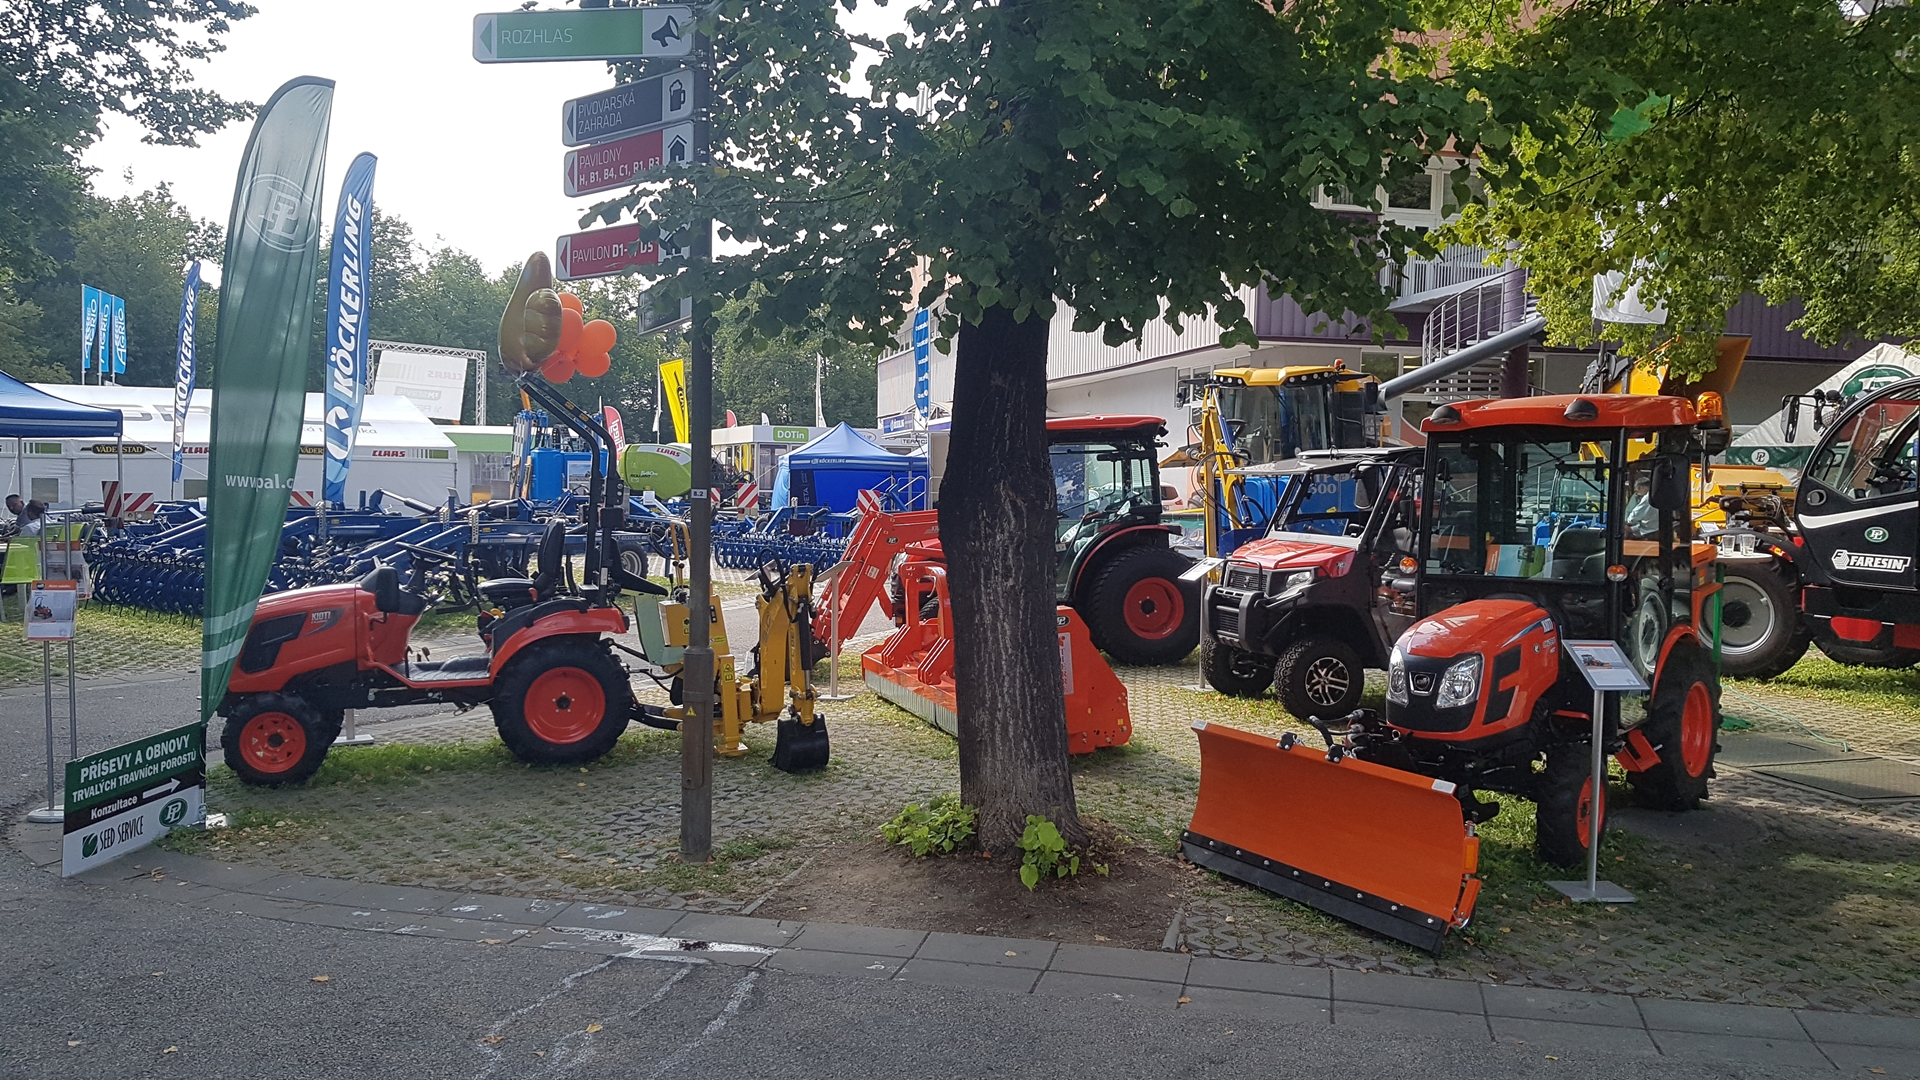 Traktory-Kioti-Zeme-Zivitelka2.jpg